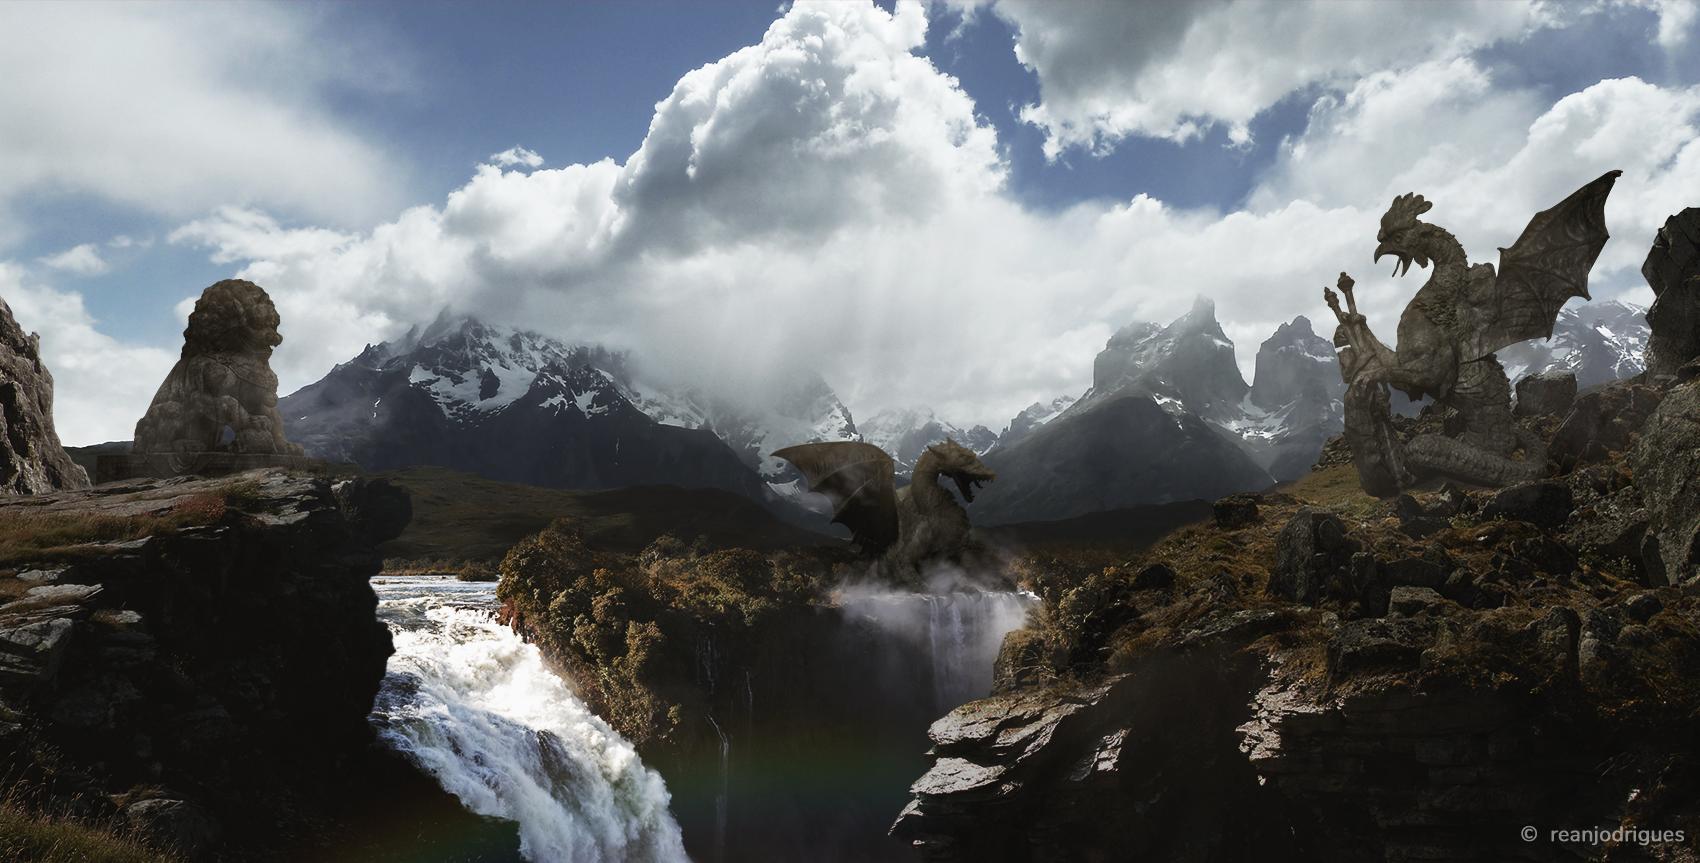 Fantasyland   The Three Kingdoms